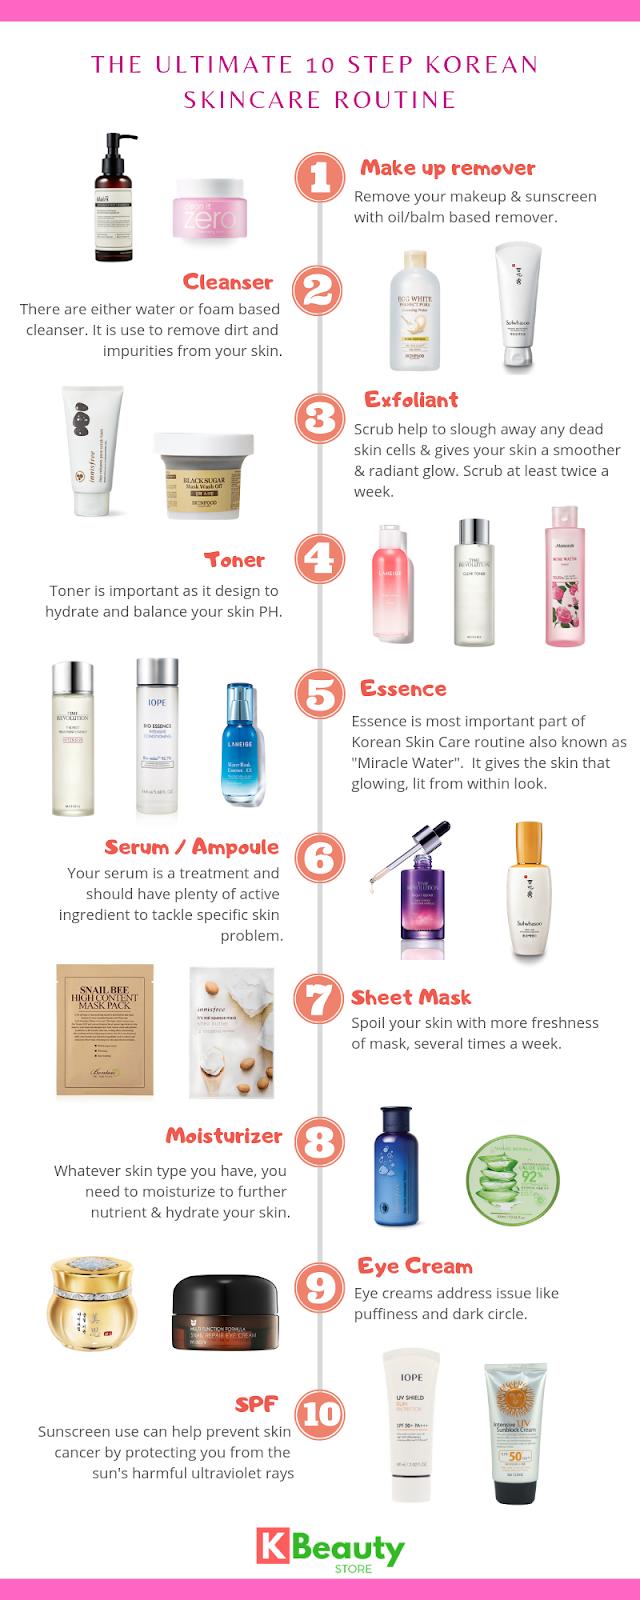 100skincare Night Skin Care Routine Organizationoutfitsaccessoriesand Stylesmakeupstudy Tipshair Korean Skincare Routine Skin Care Routine Skin Care Steps